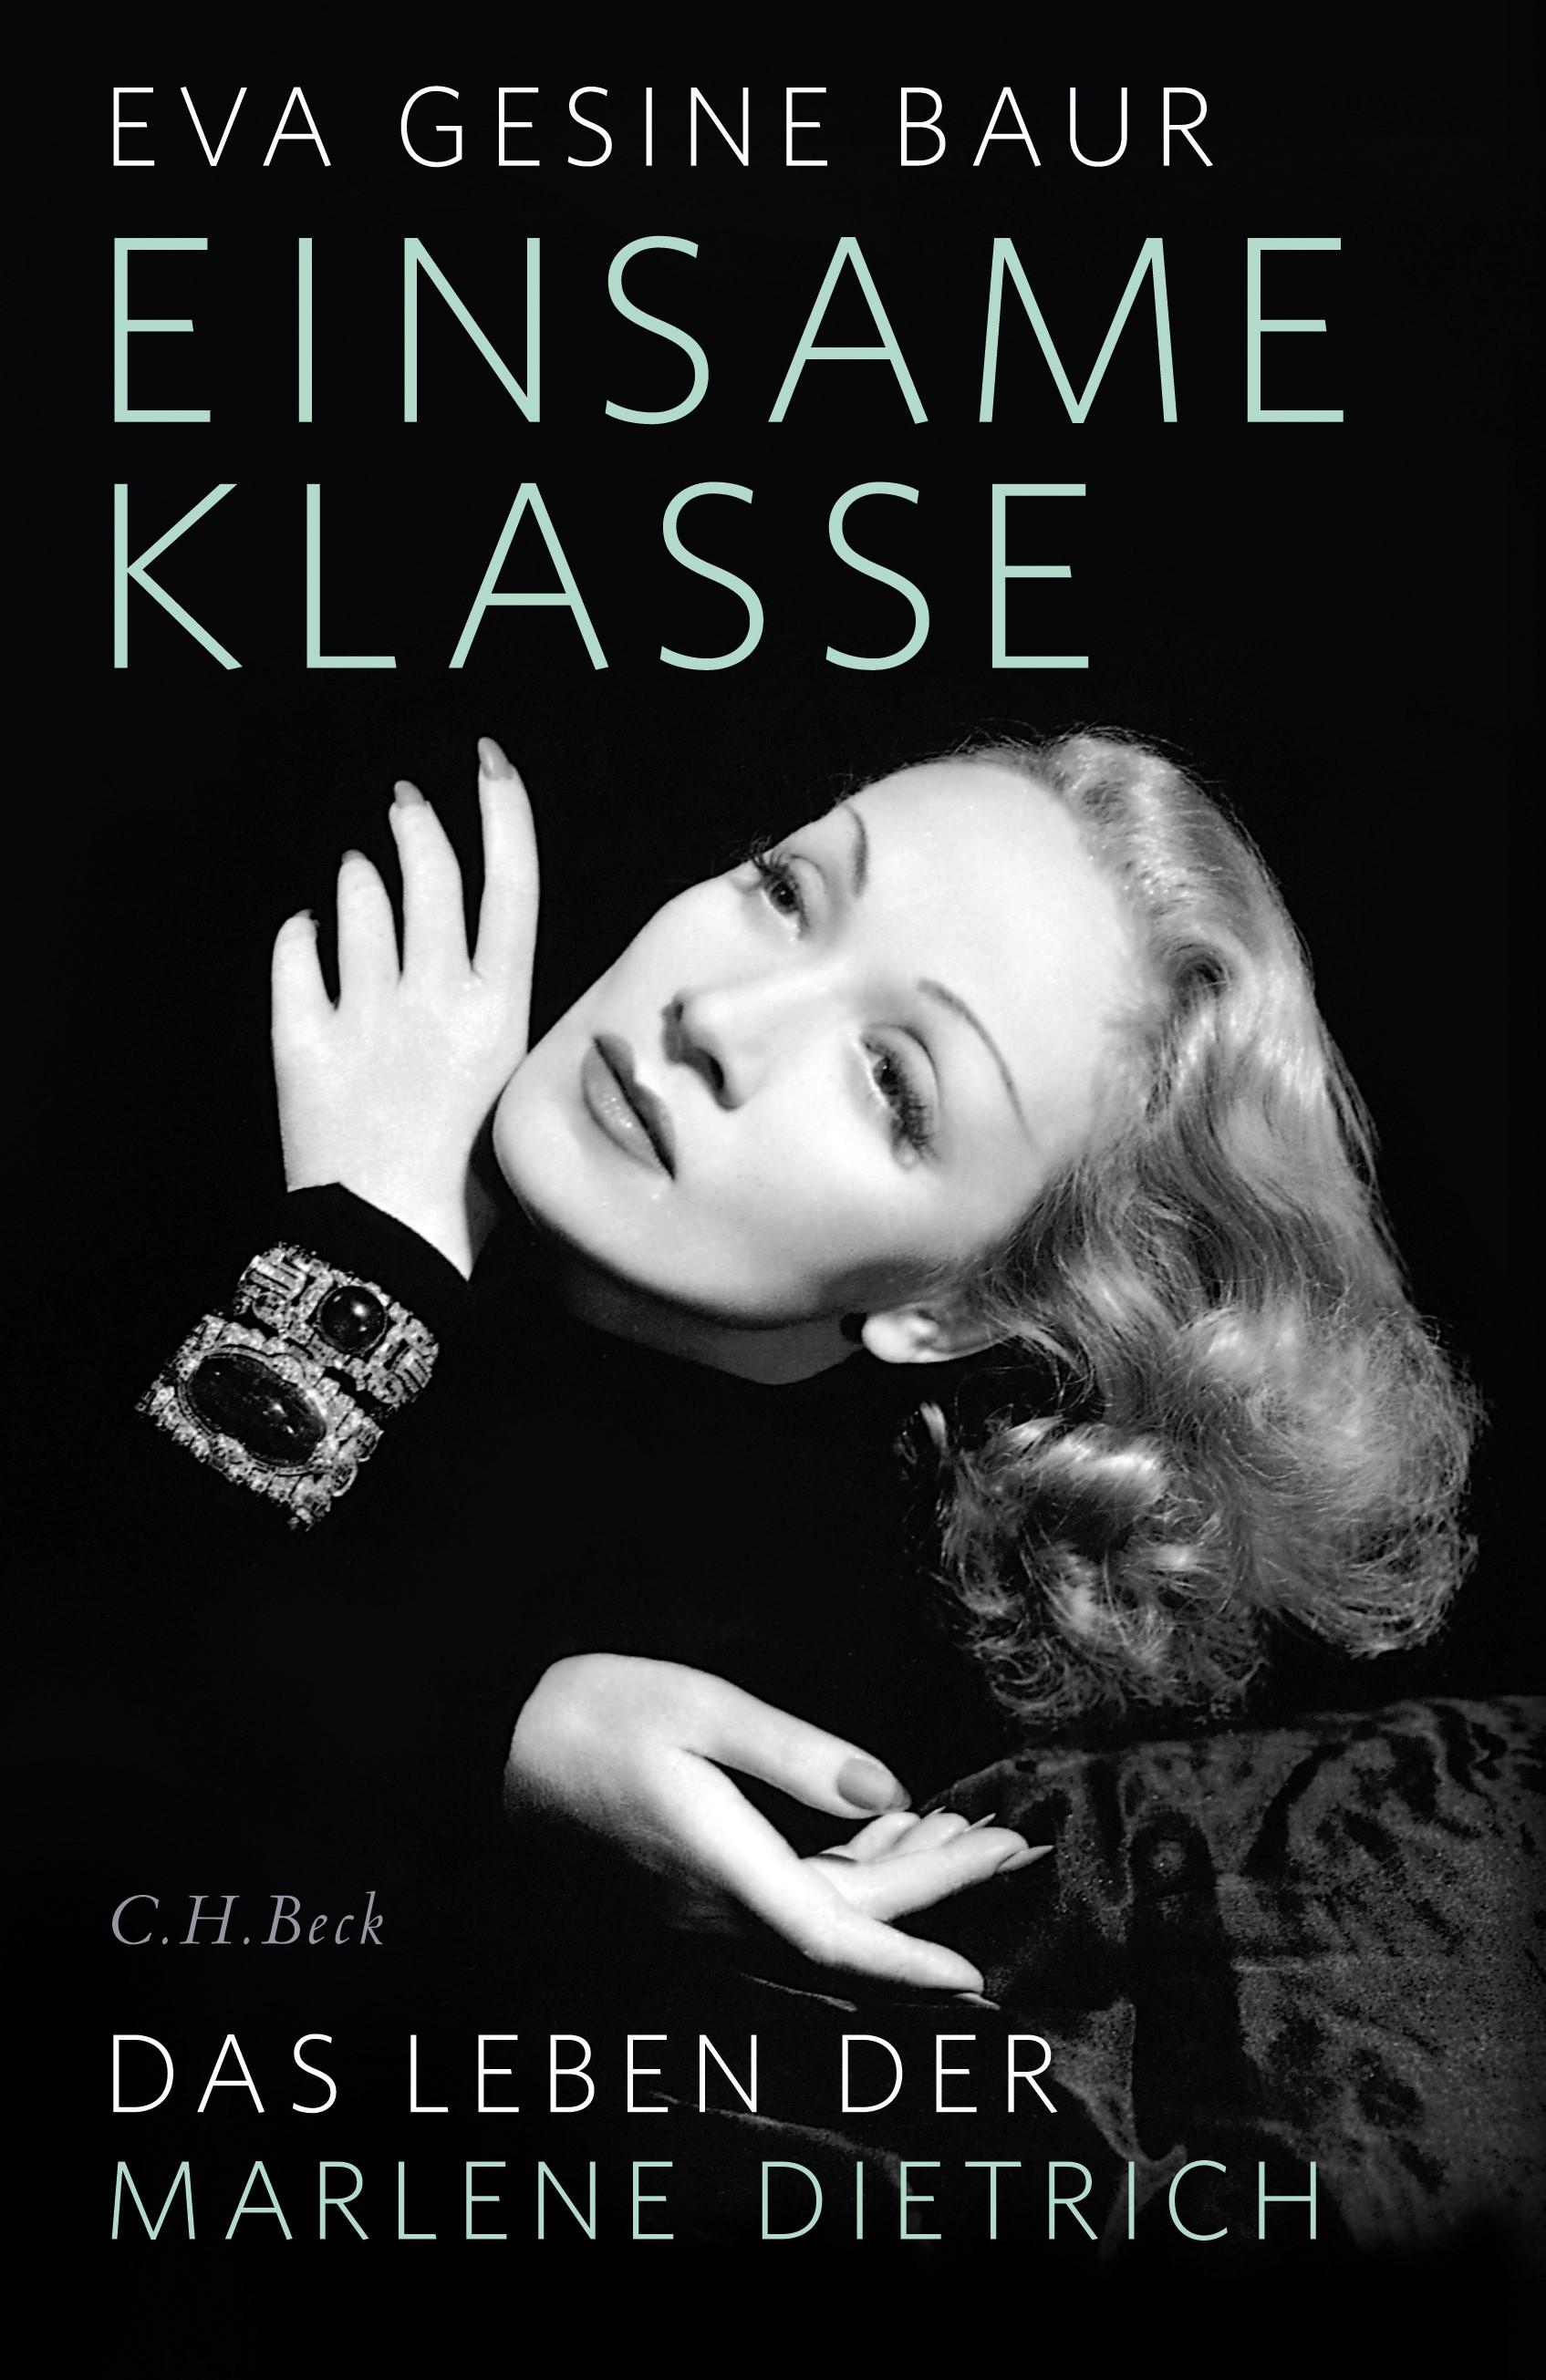 Cover des Buches 'Einsame Klasse'